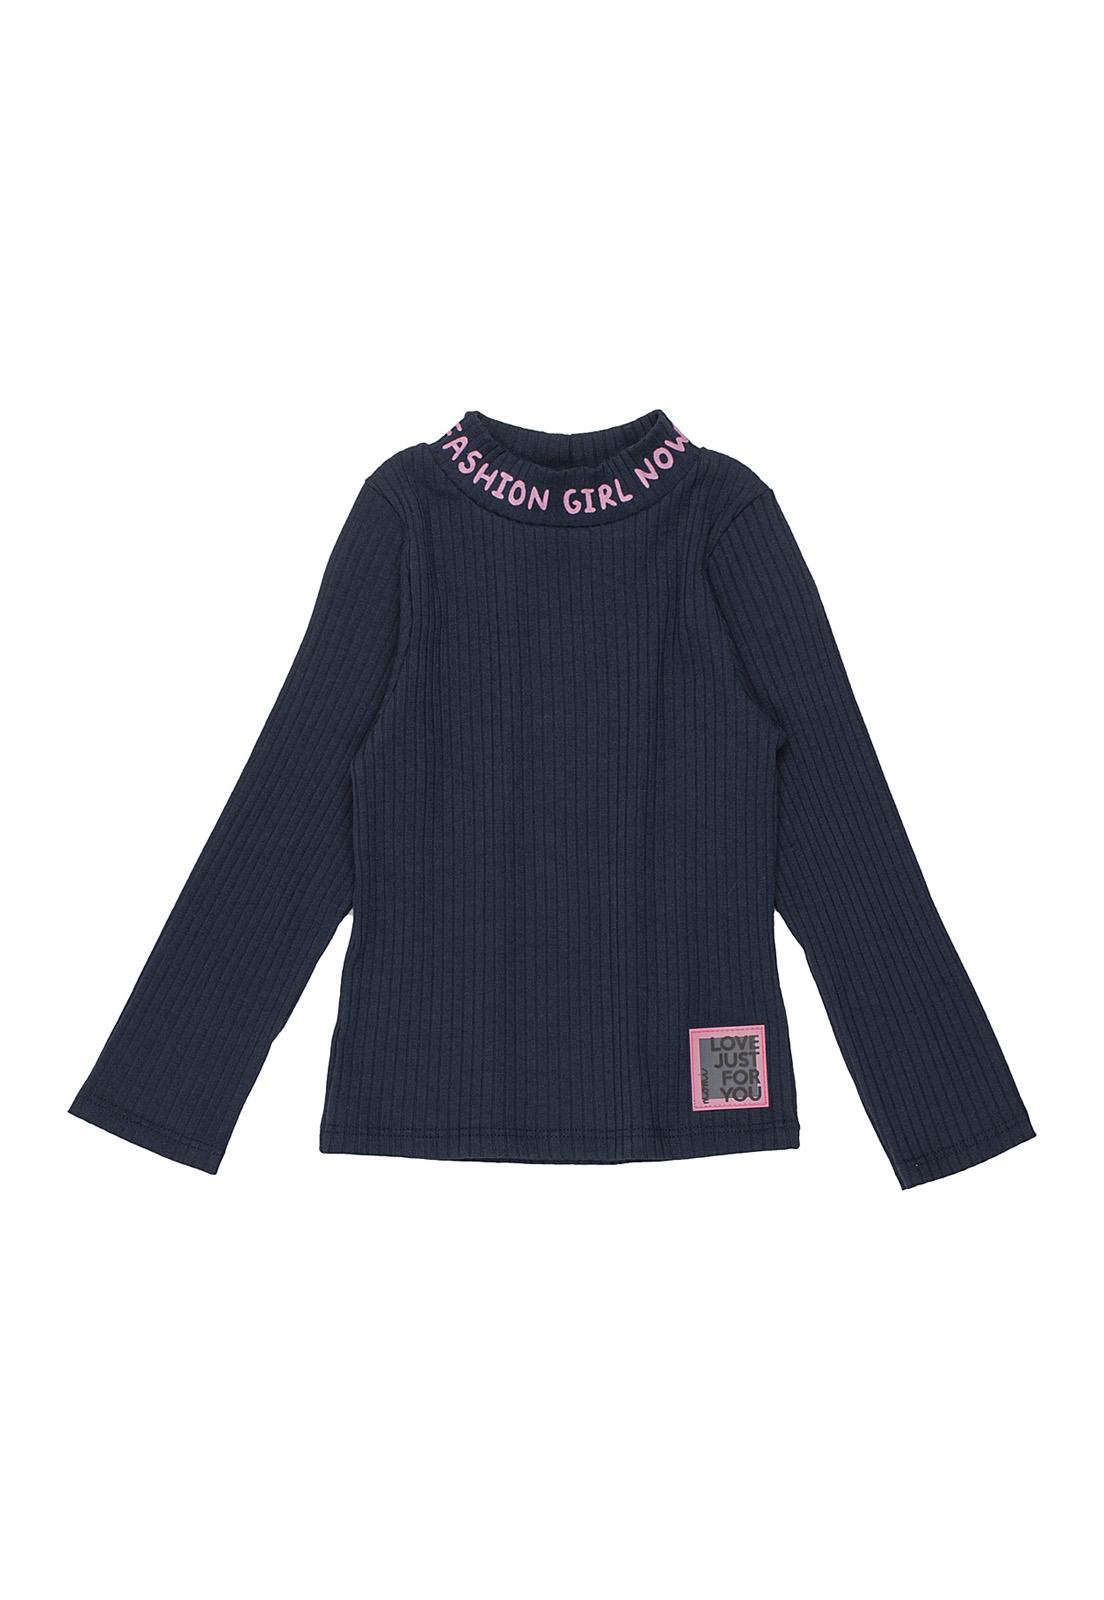 Blusa Infantil Canelada Manga Longa Fashion Girl Azul Marinho Momi